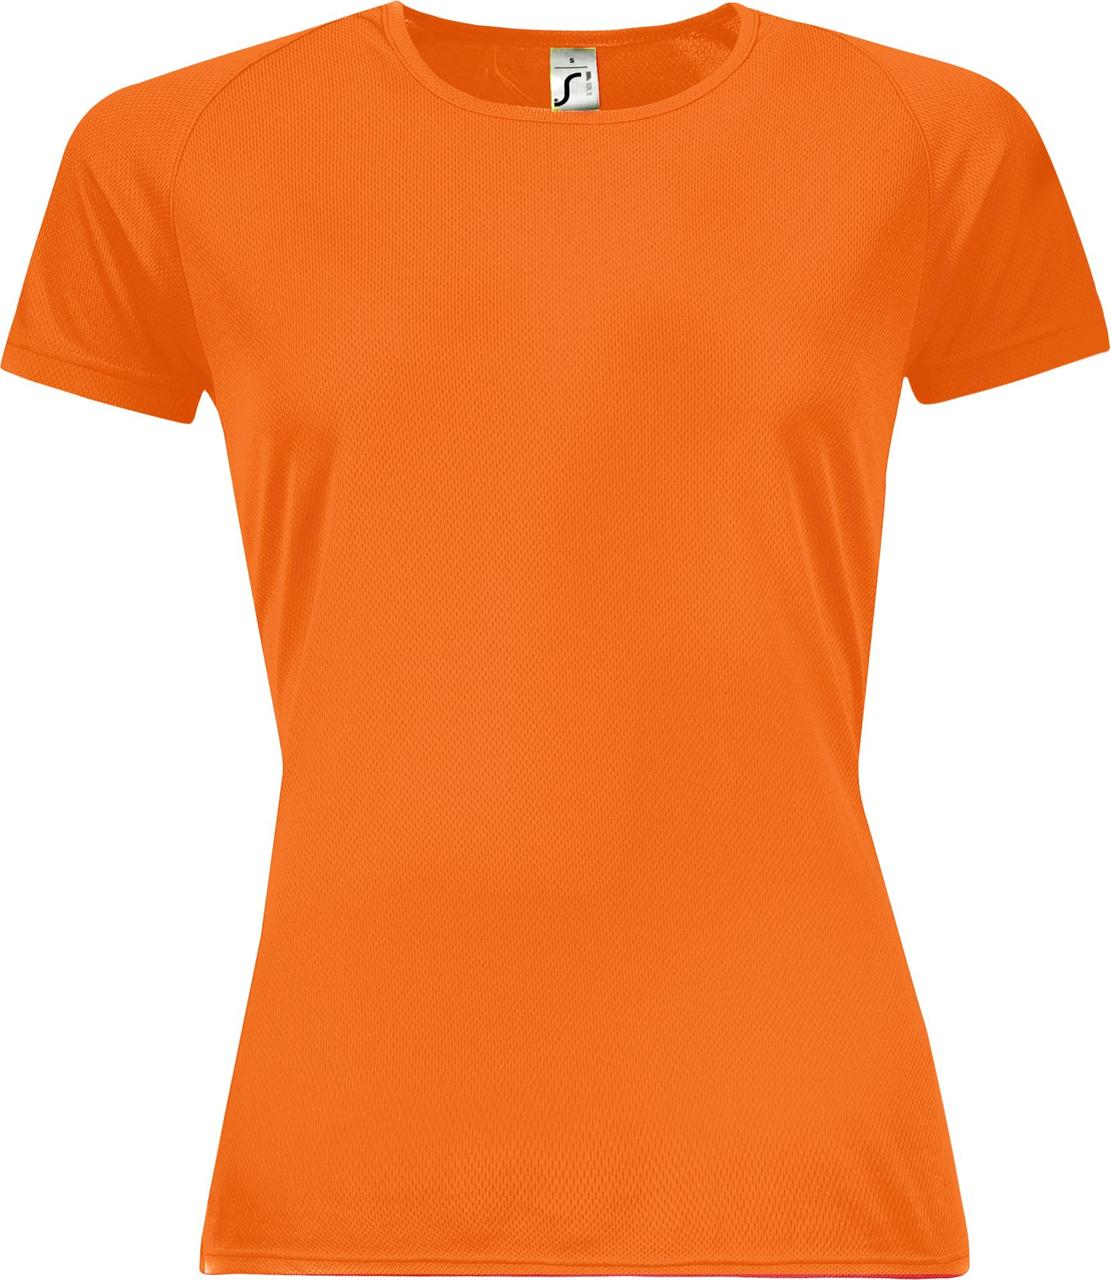 Футболка женская Sporty Women 140, оранжевый неон (артикул 01159404)